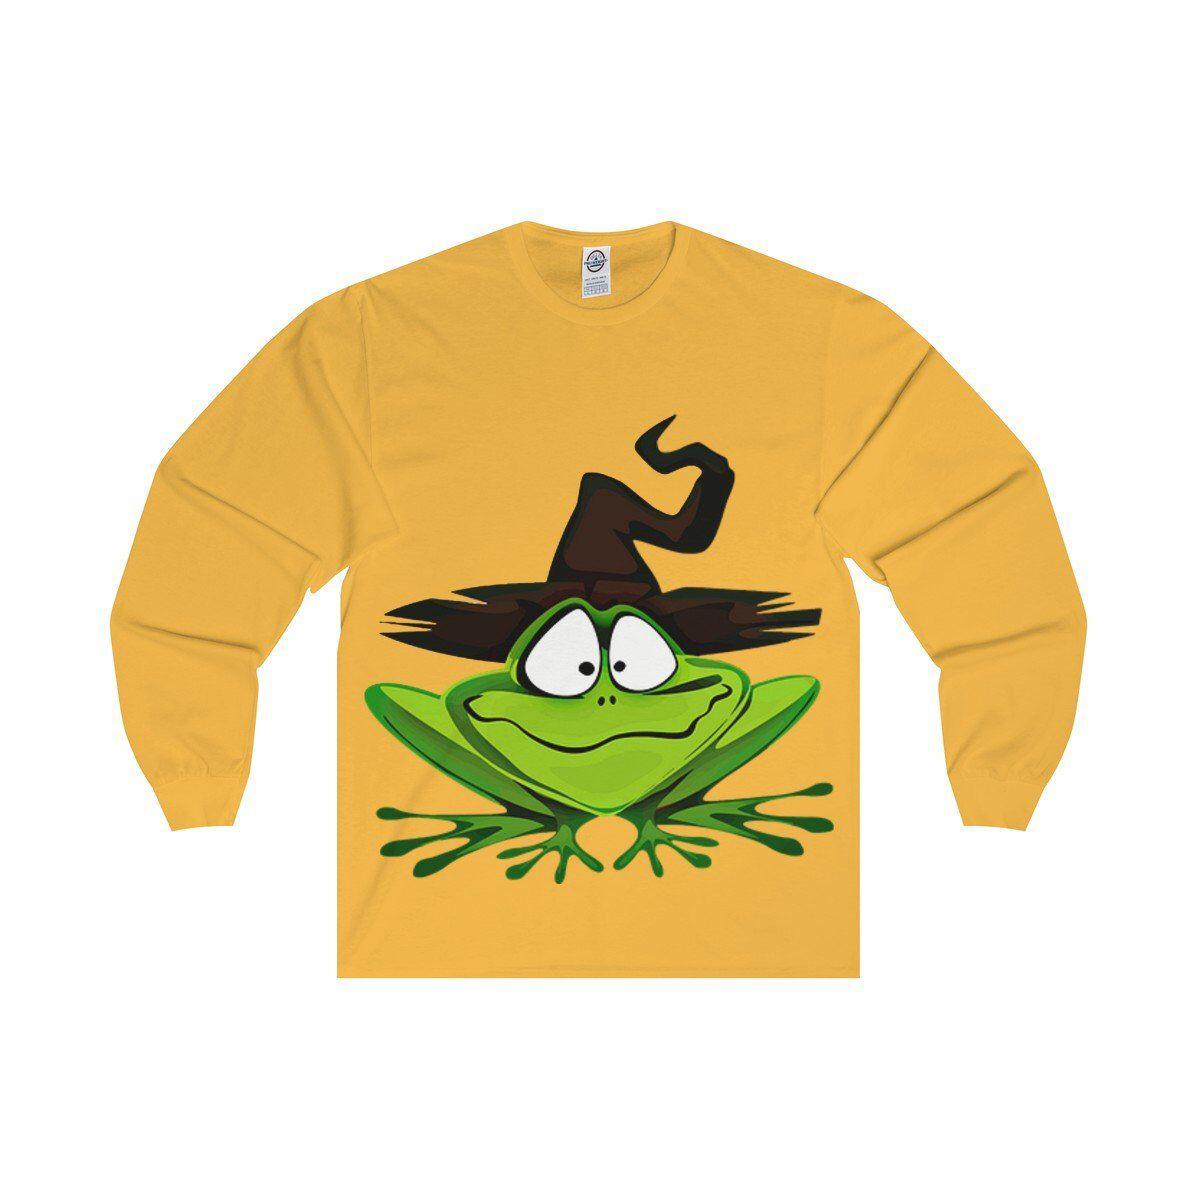 Frog witch long sleeve tee halloween novelty halloween tee